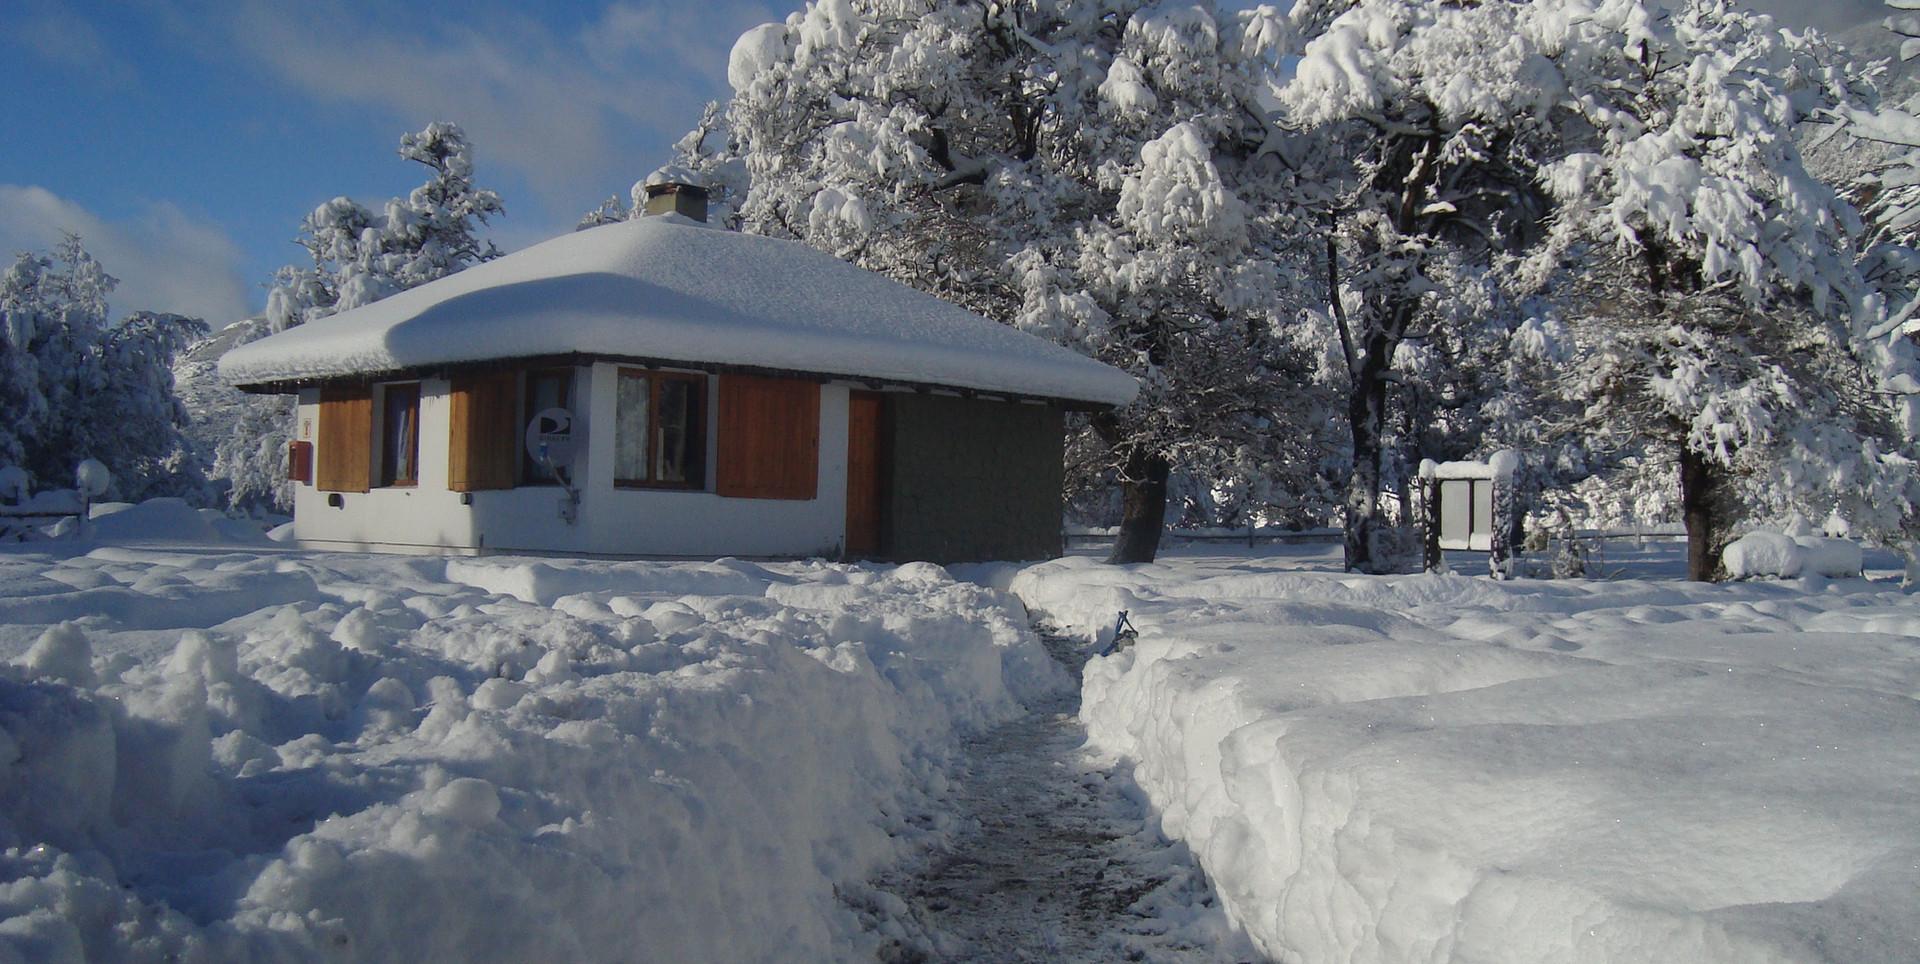 Gran nevada